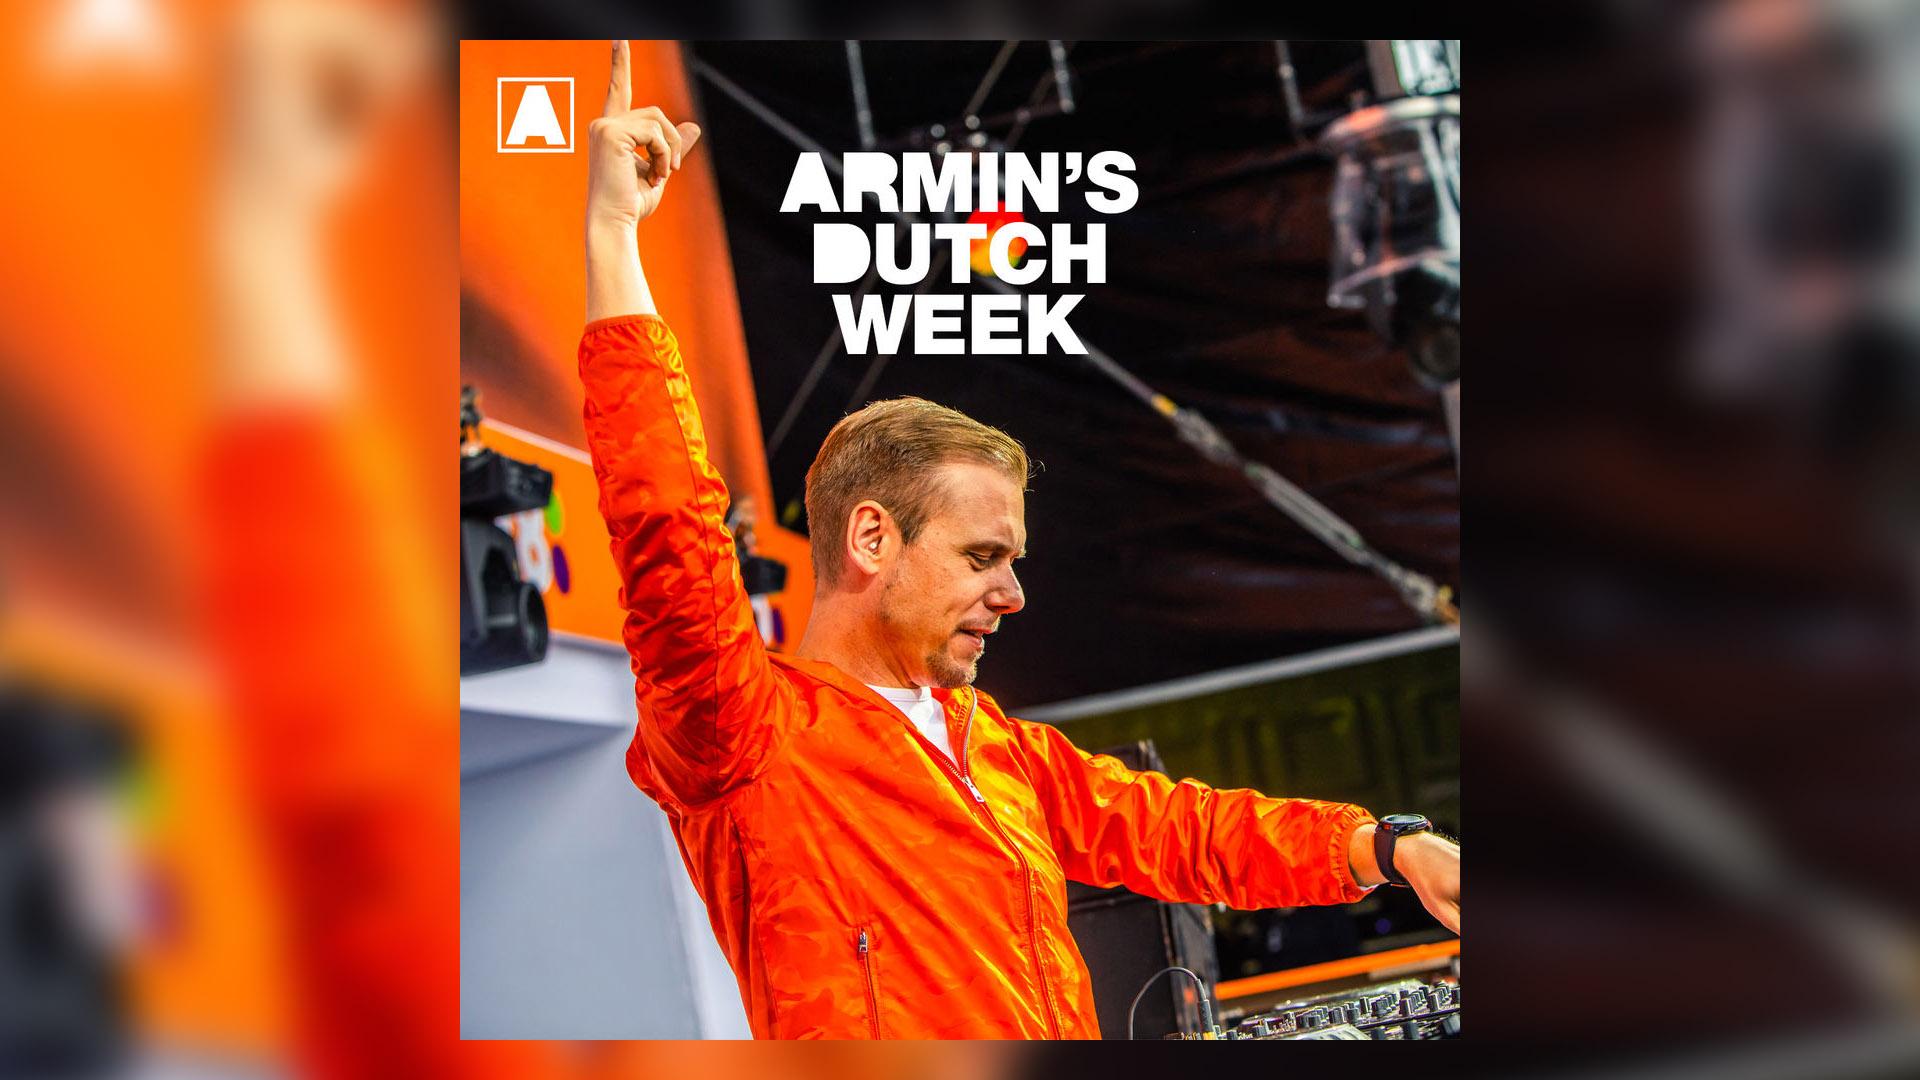 Armin's Dutch Week